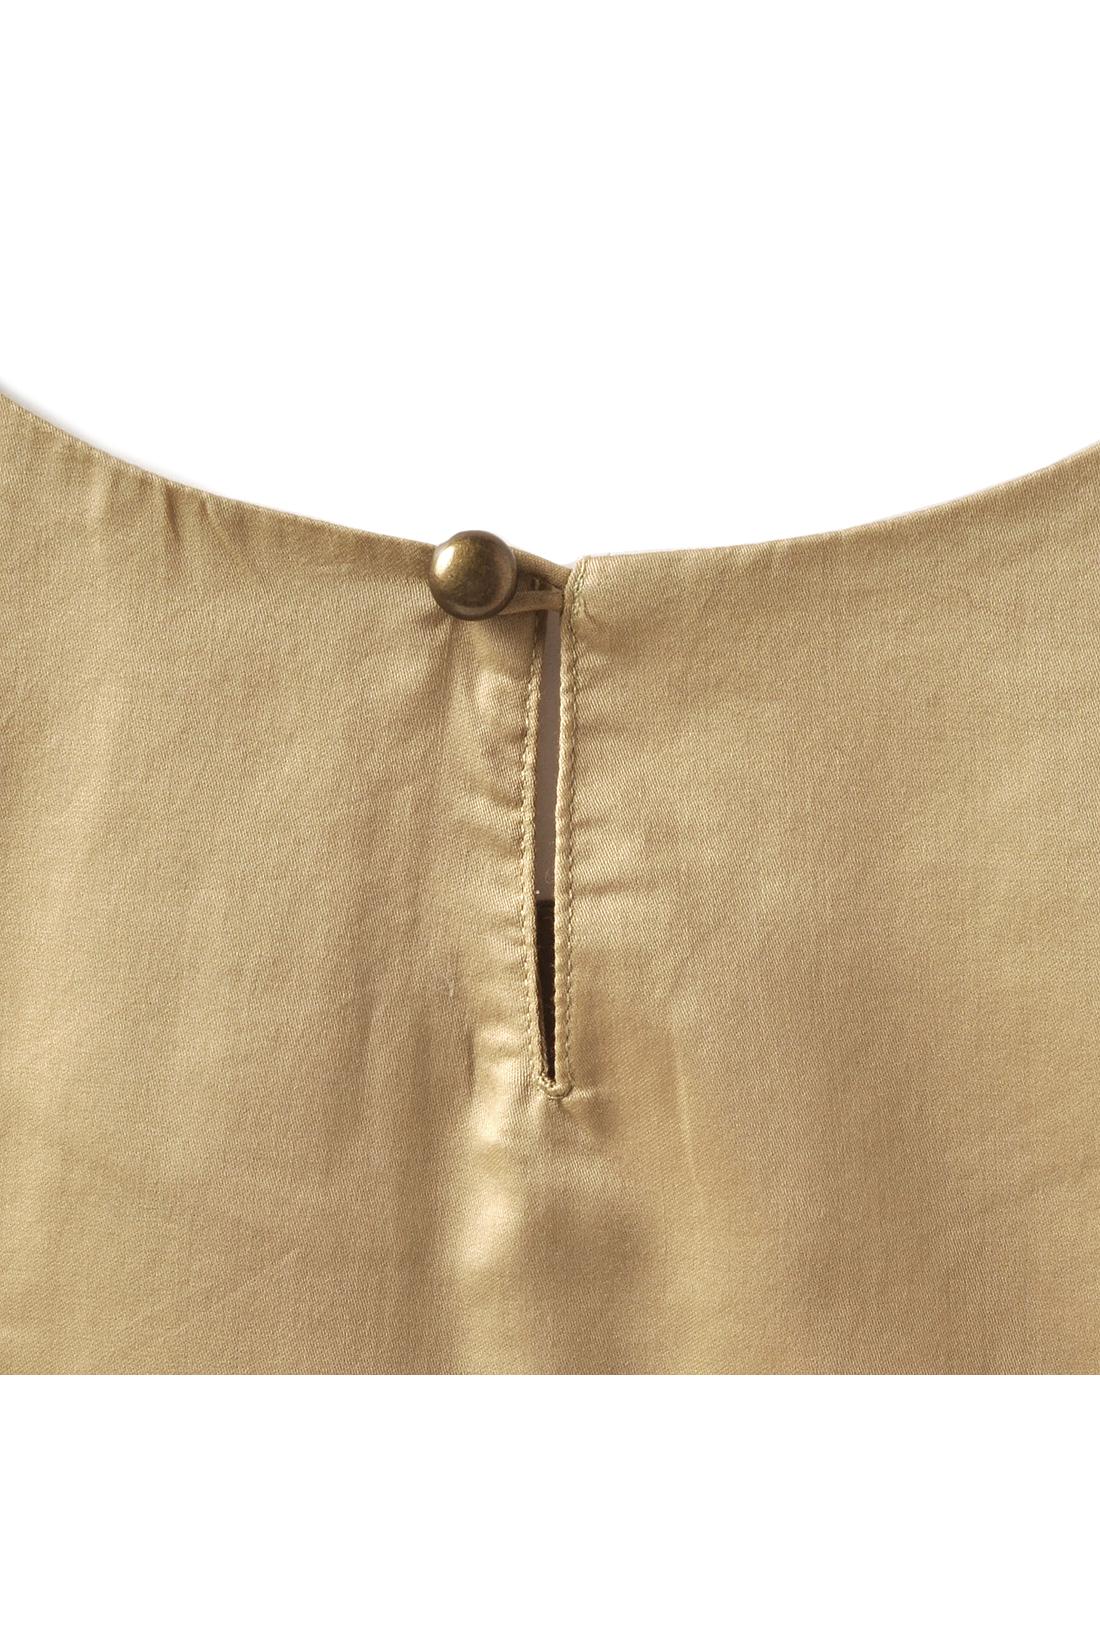 Back バックの涙開き&アンティークゴールドのボタンで360度スキのない好印象デザインに。